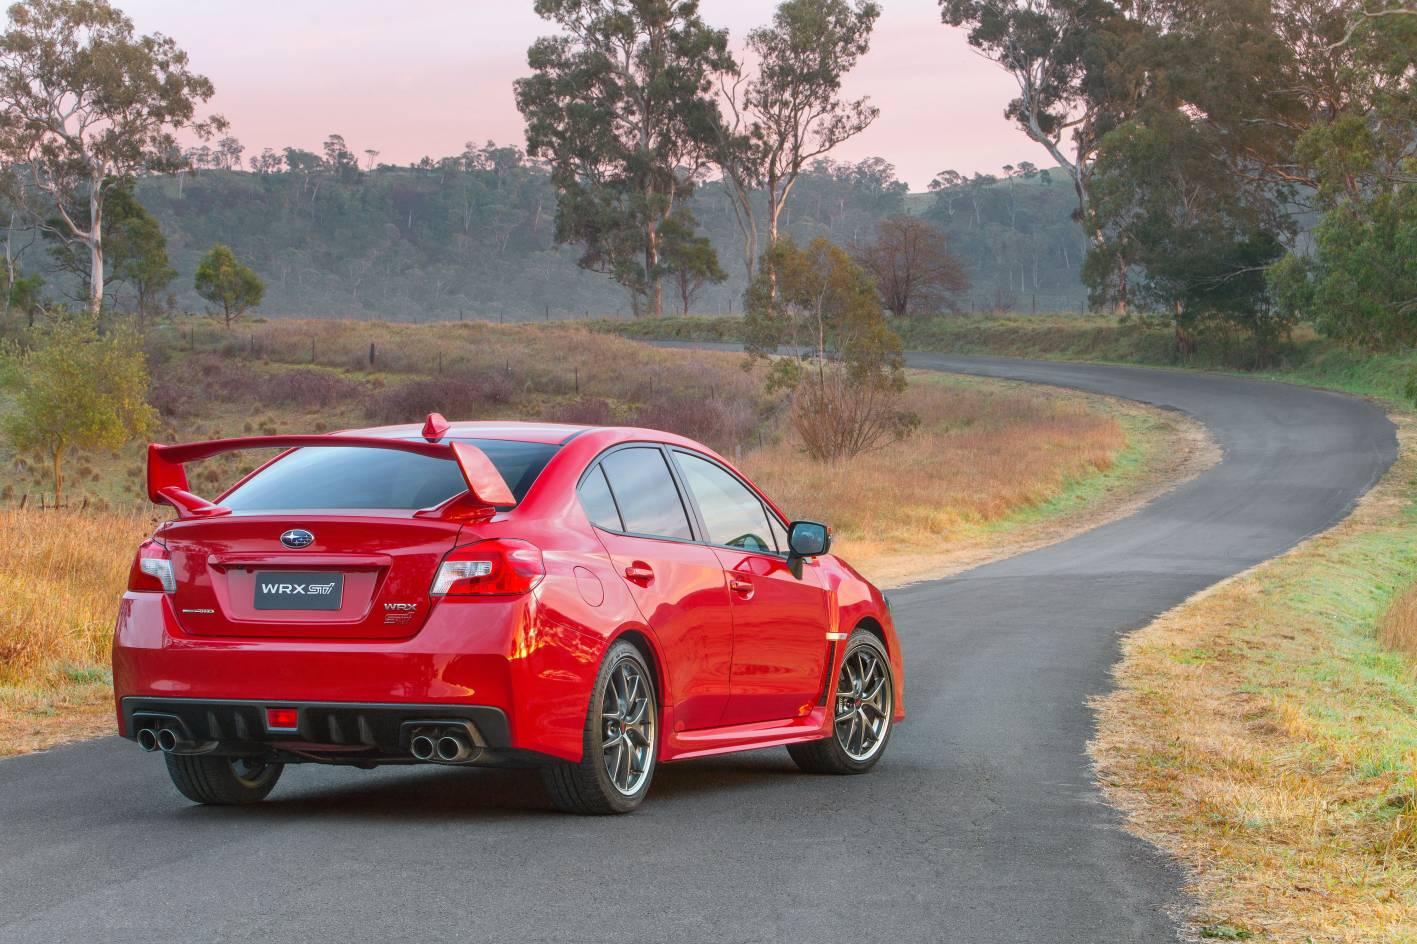 Subaru WRX — Auto Expert by John Cadogan - save thousands on